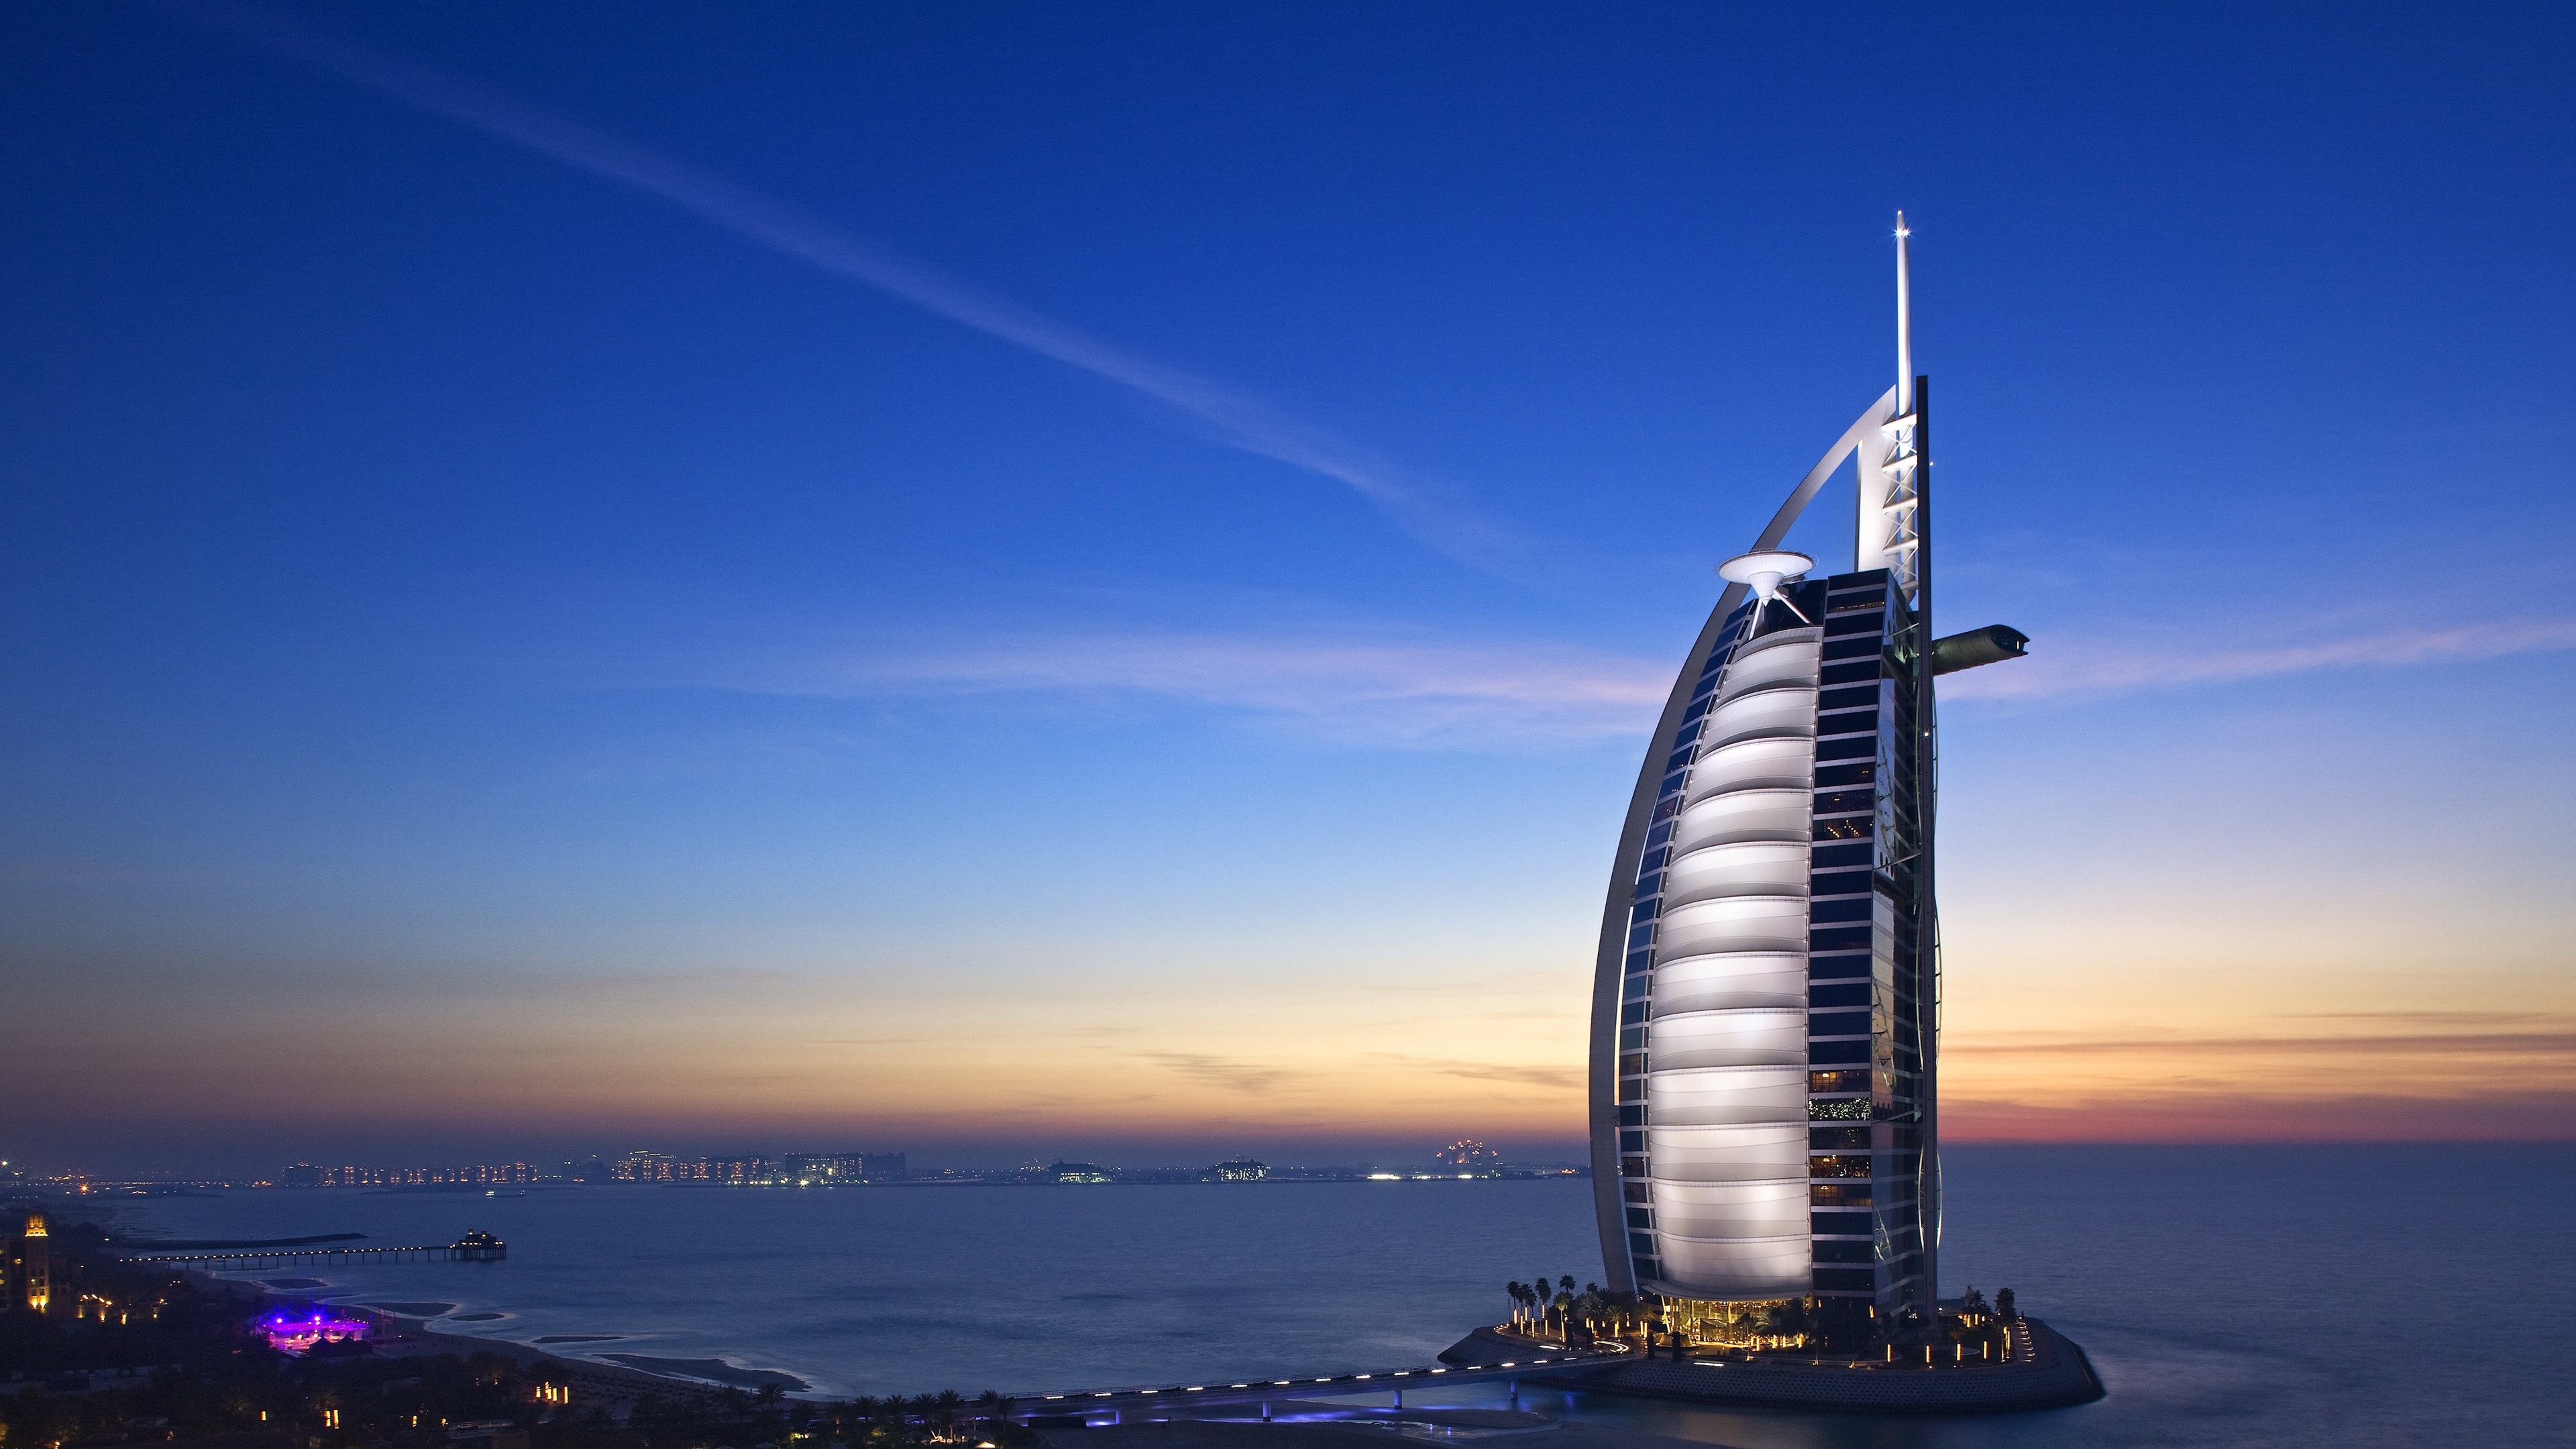 burj al arab dubai united arab emirates uhd 4k wallpaper